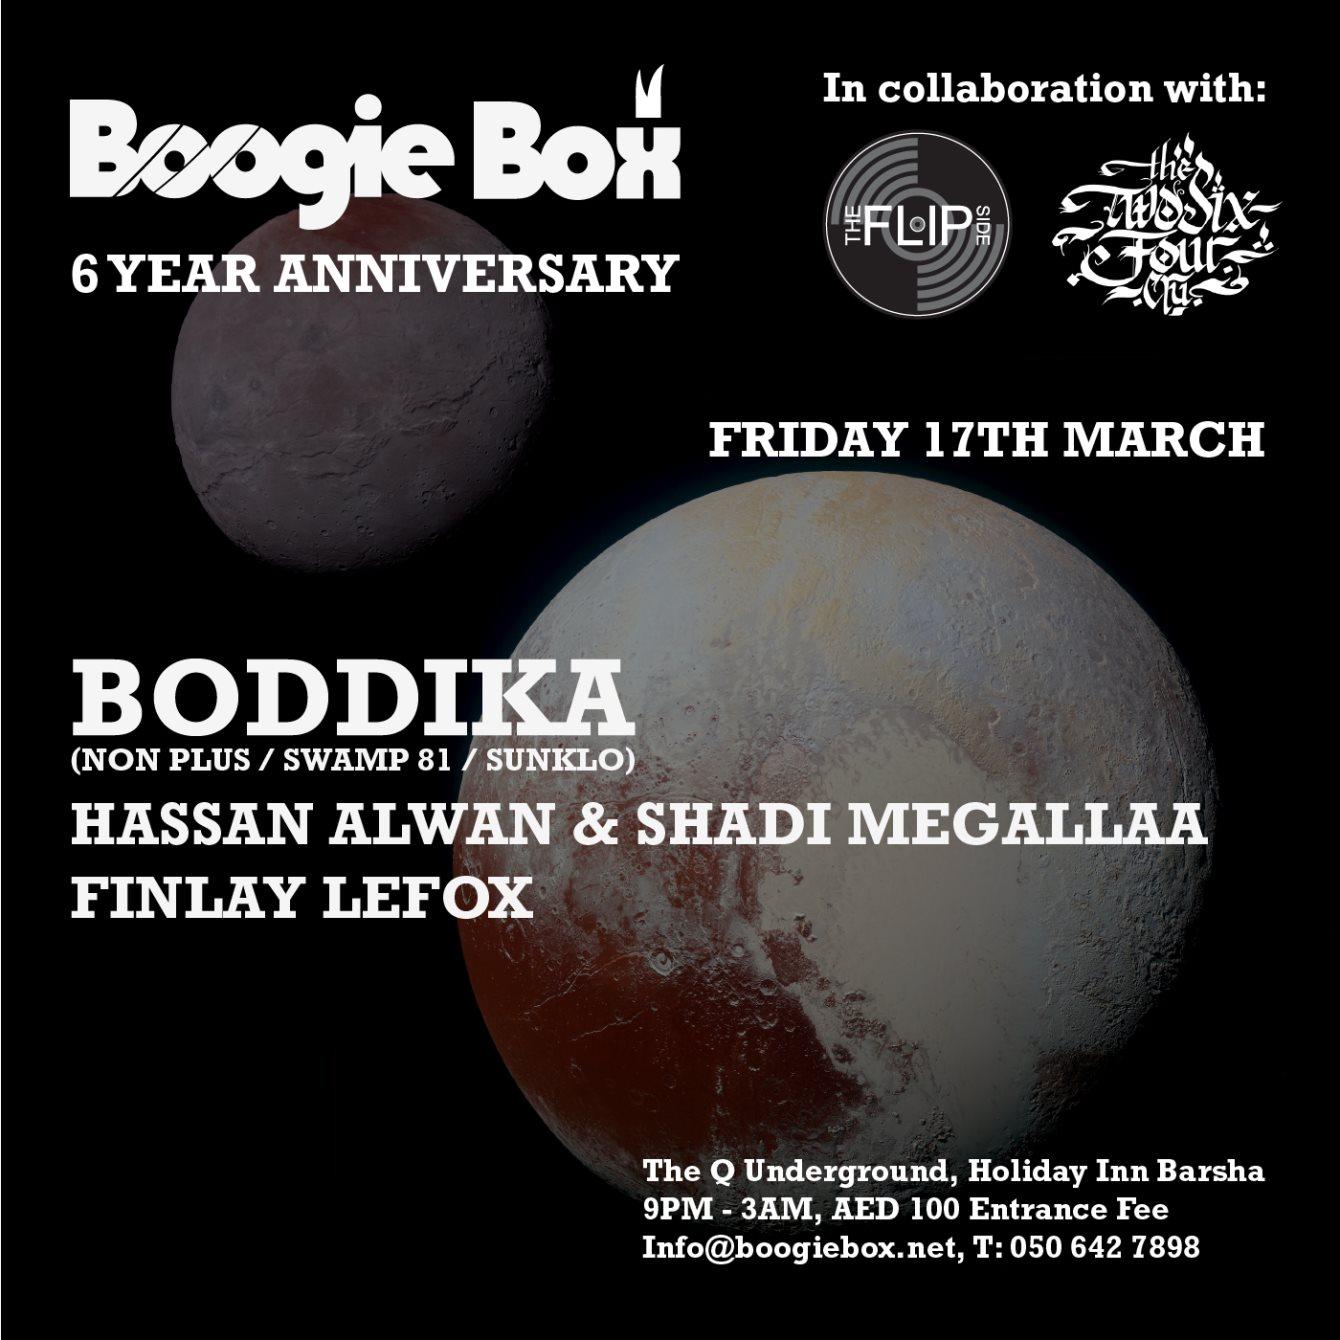 Boogie Box x The 264 Cru x The Flip Side present: Boddika - Flyer front